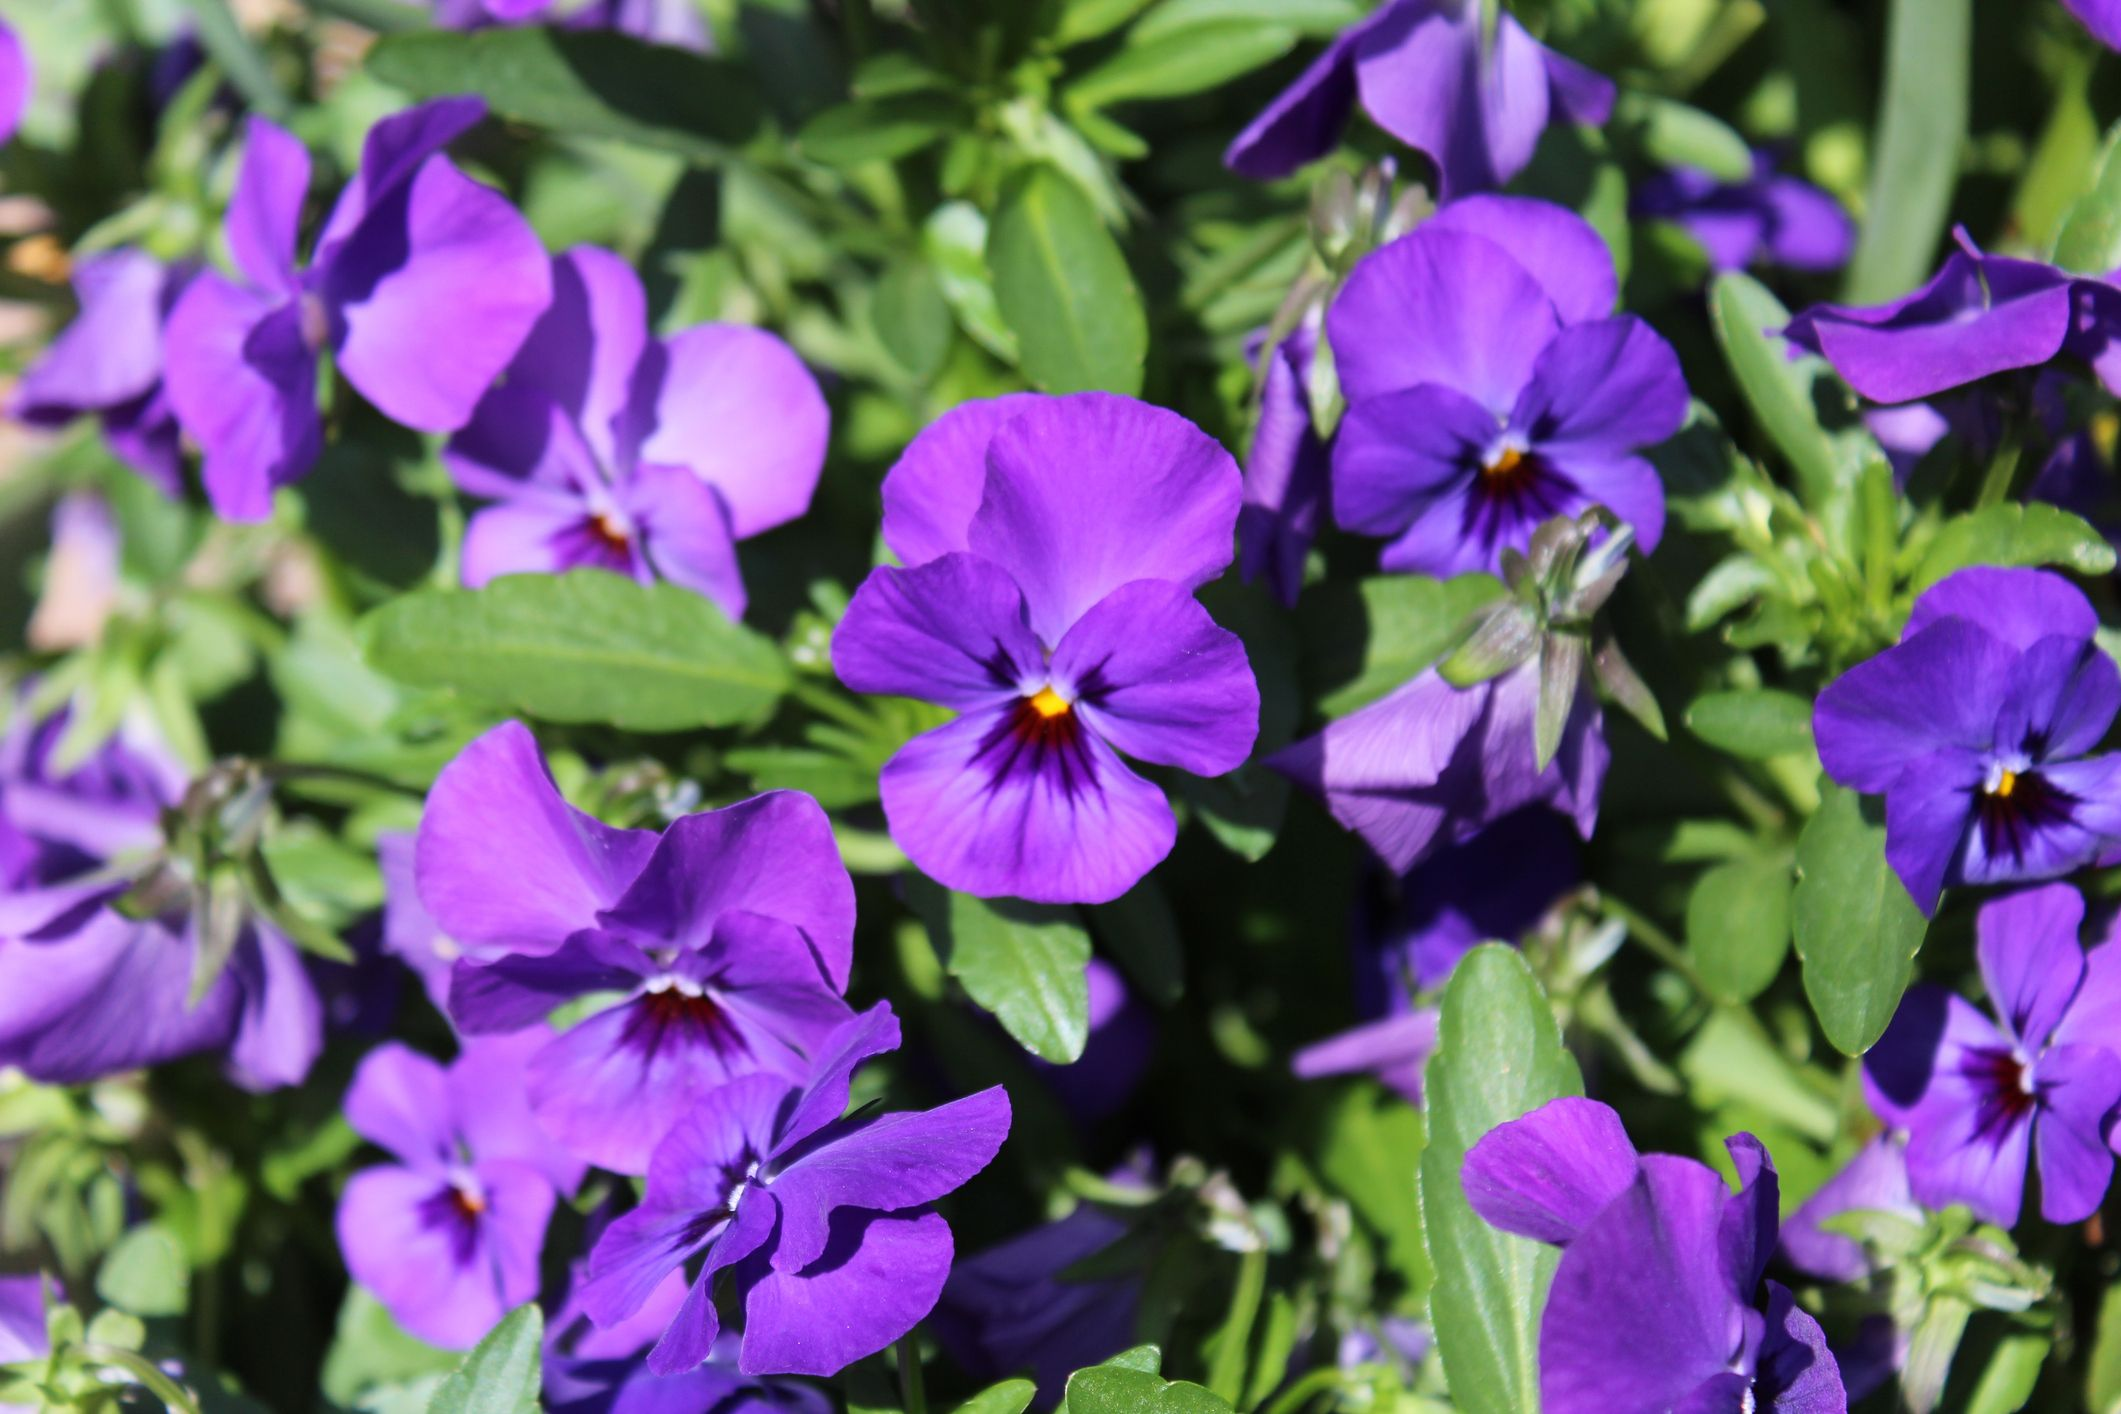 45. Violet - Rhode Island